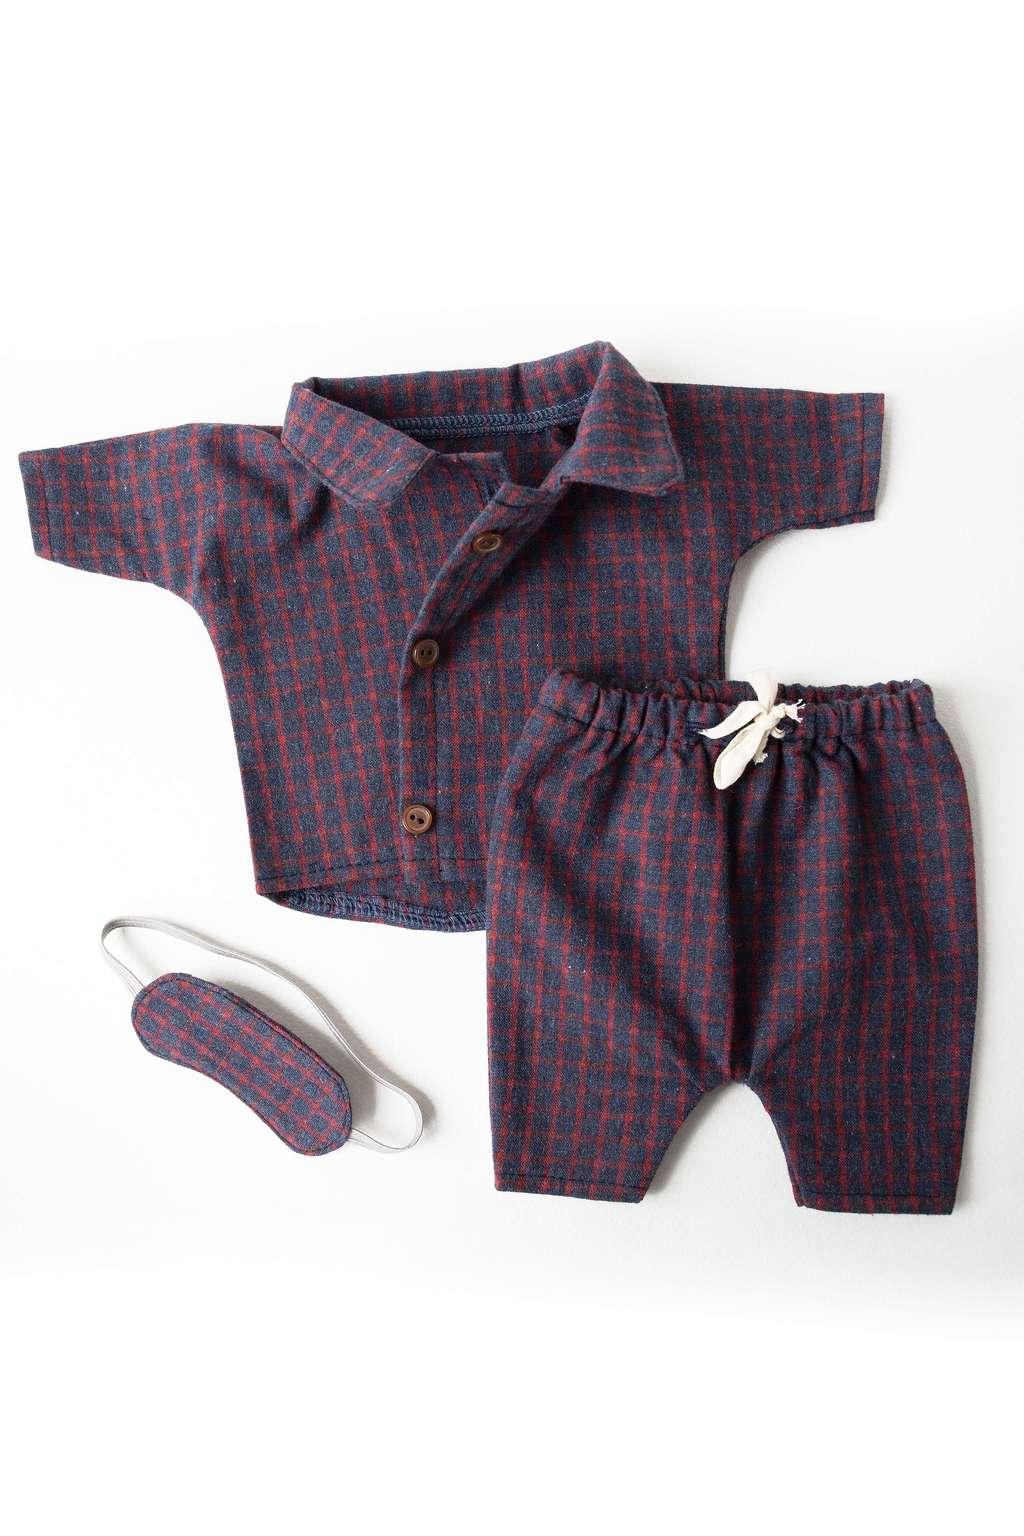 Philomena Kloss klær - pysjamas-sett -